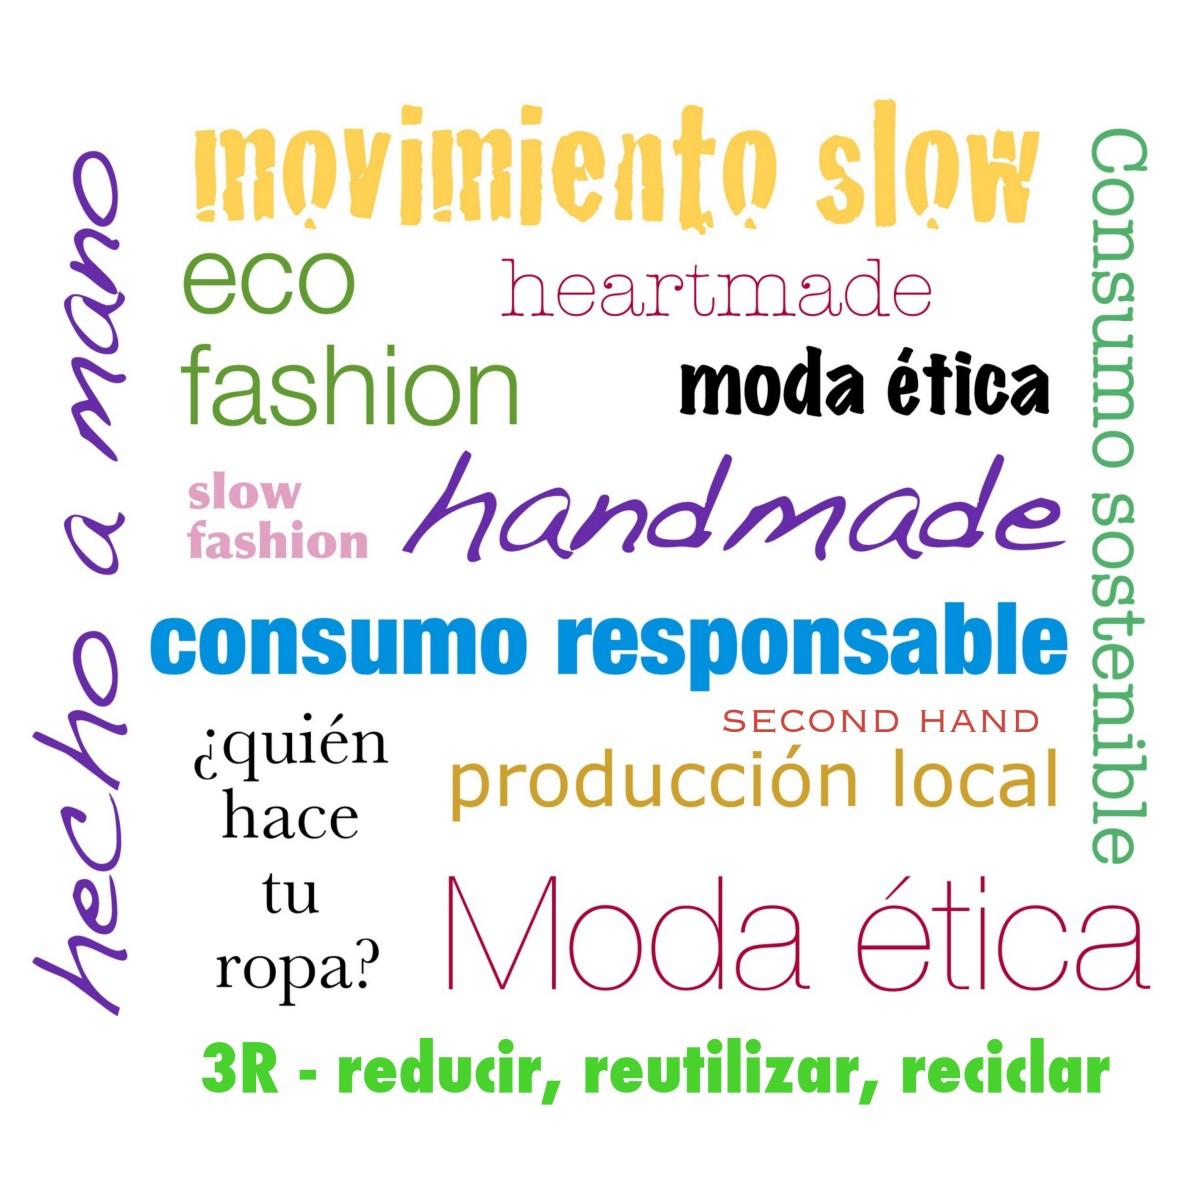 Dónde comprar moda ética  -  #slowfashion